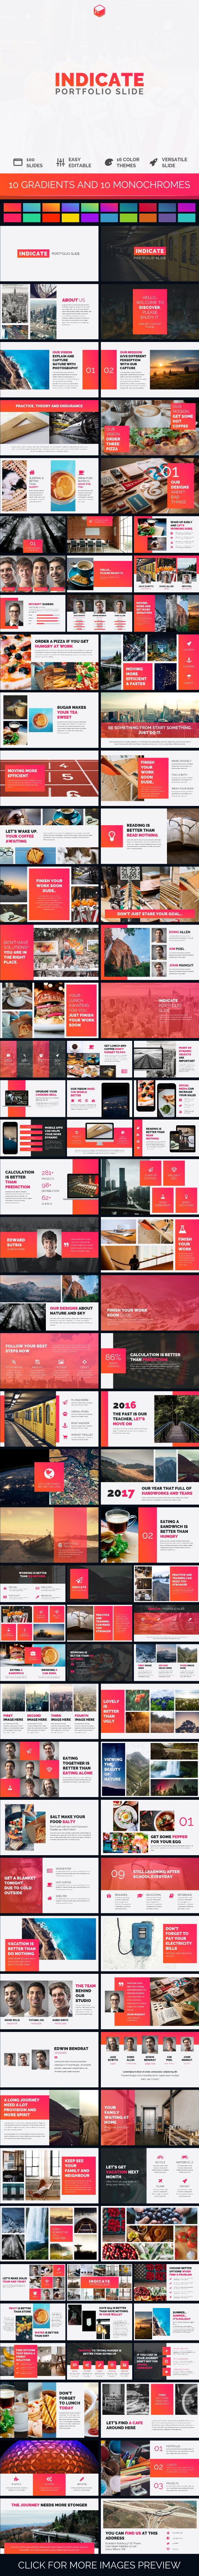 Indicate - Portfolio Slide - PowerPoint Templates Presentation Templates